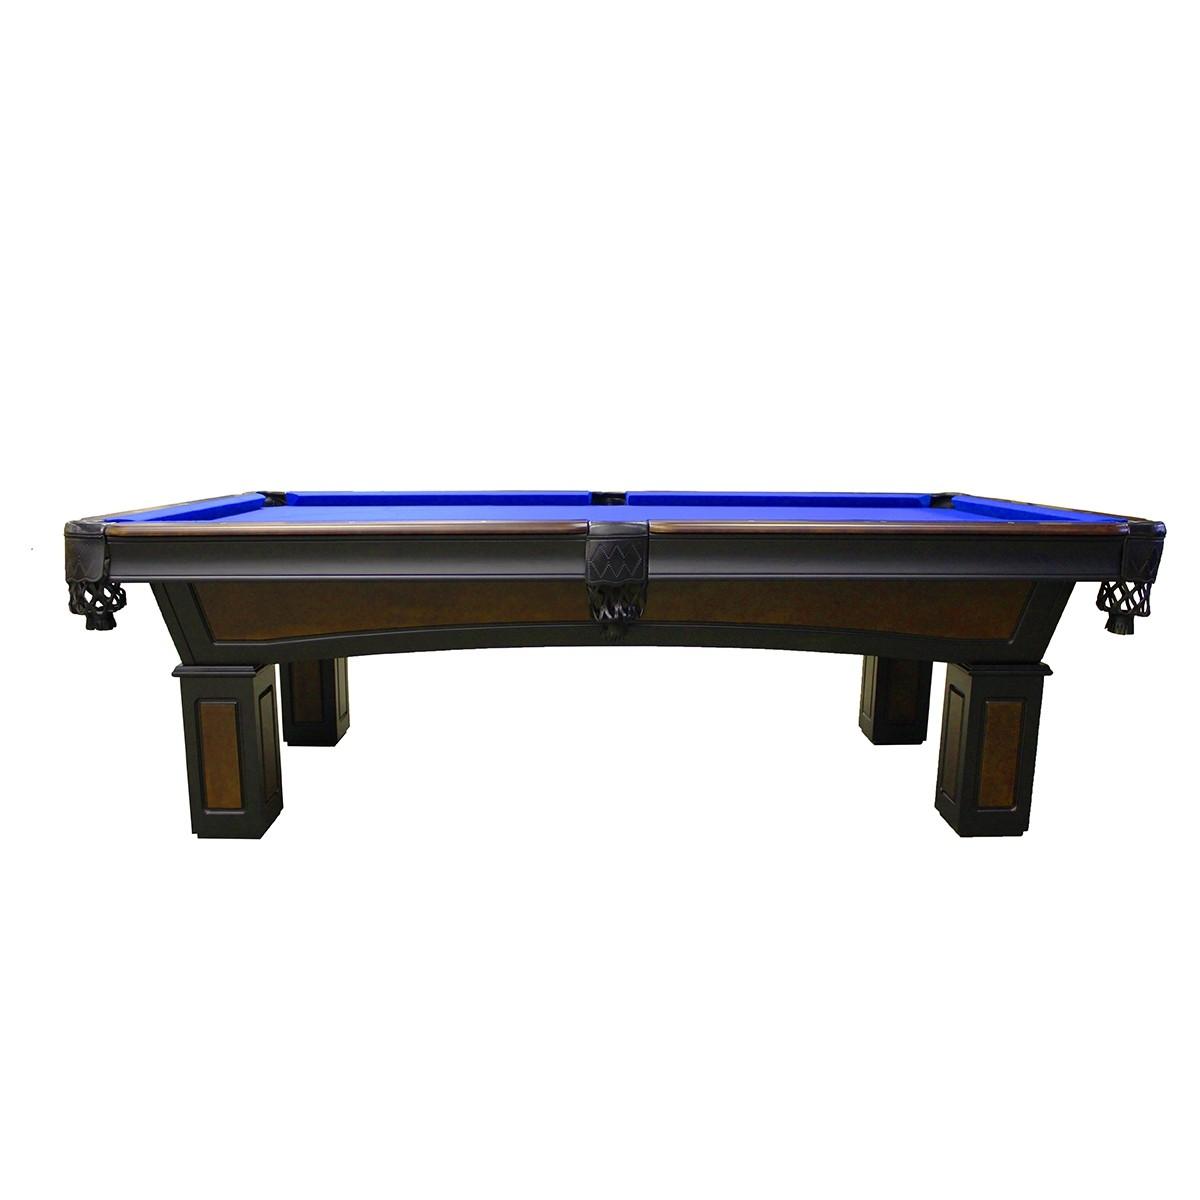 8u0027 Imperial Truro Antique Walnut Pool Table With Black Legs    GameTablesOnline.com